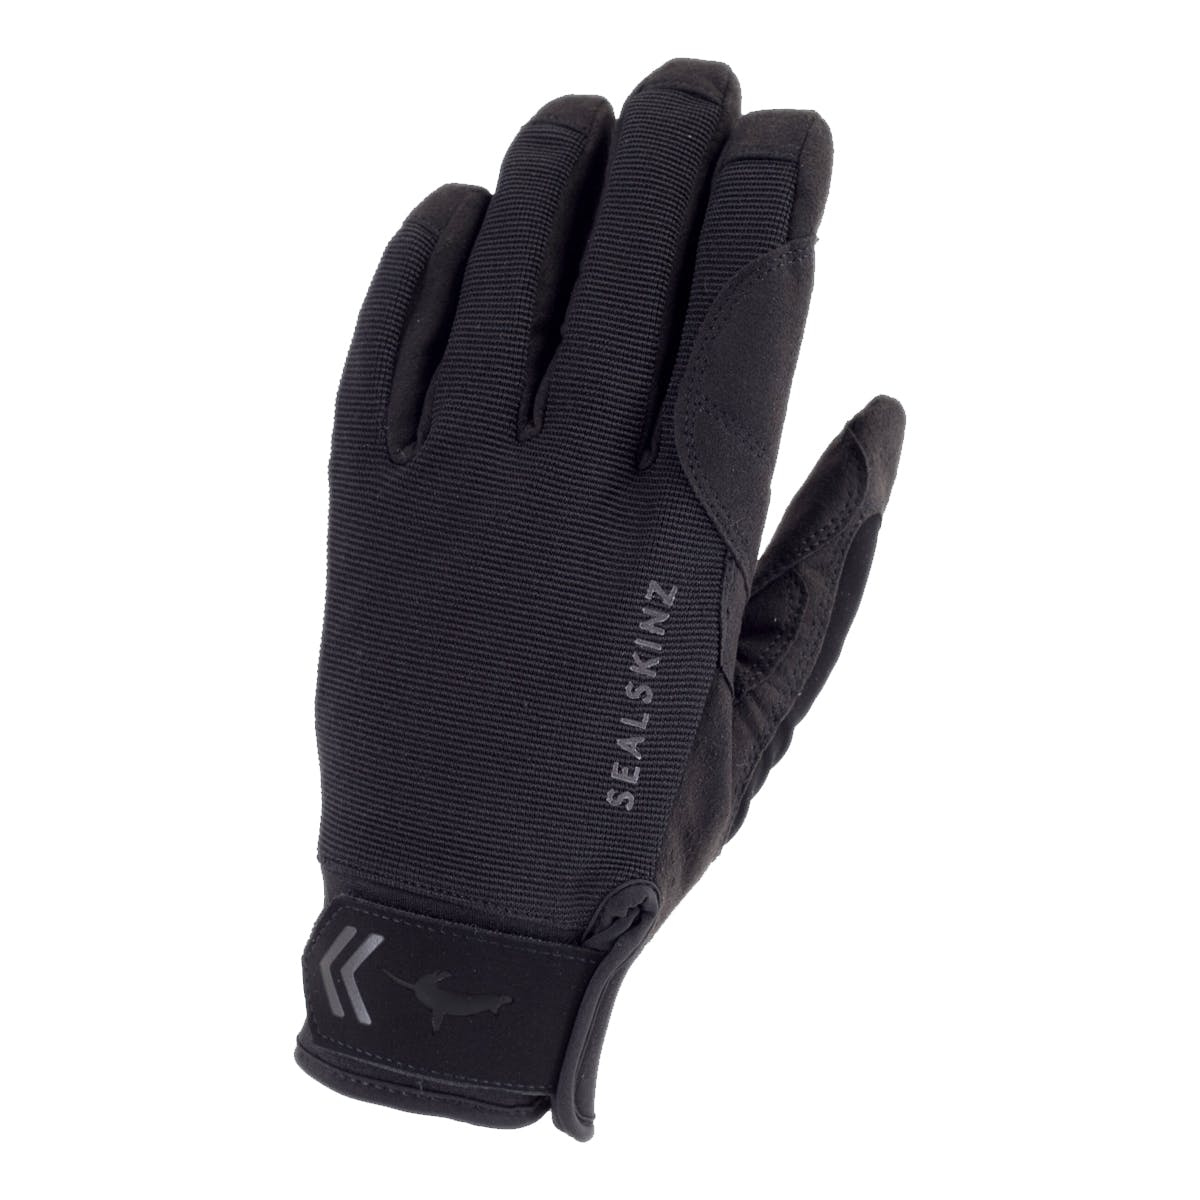 photo: SealSkinz Waterproof All Weather Glove waterproof glove/mitten